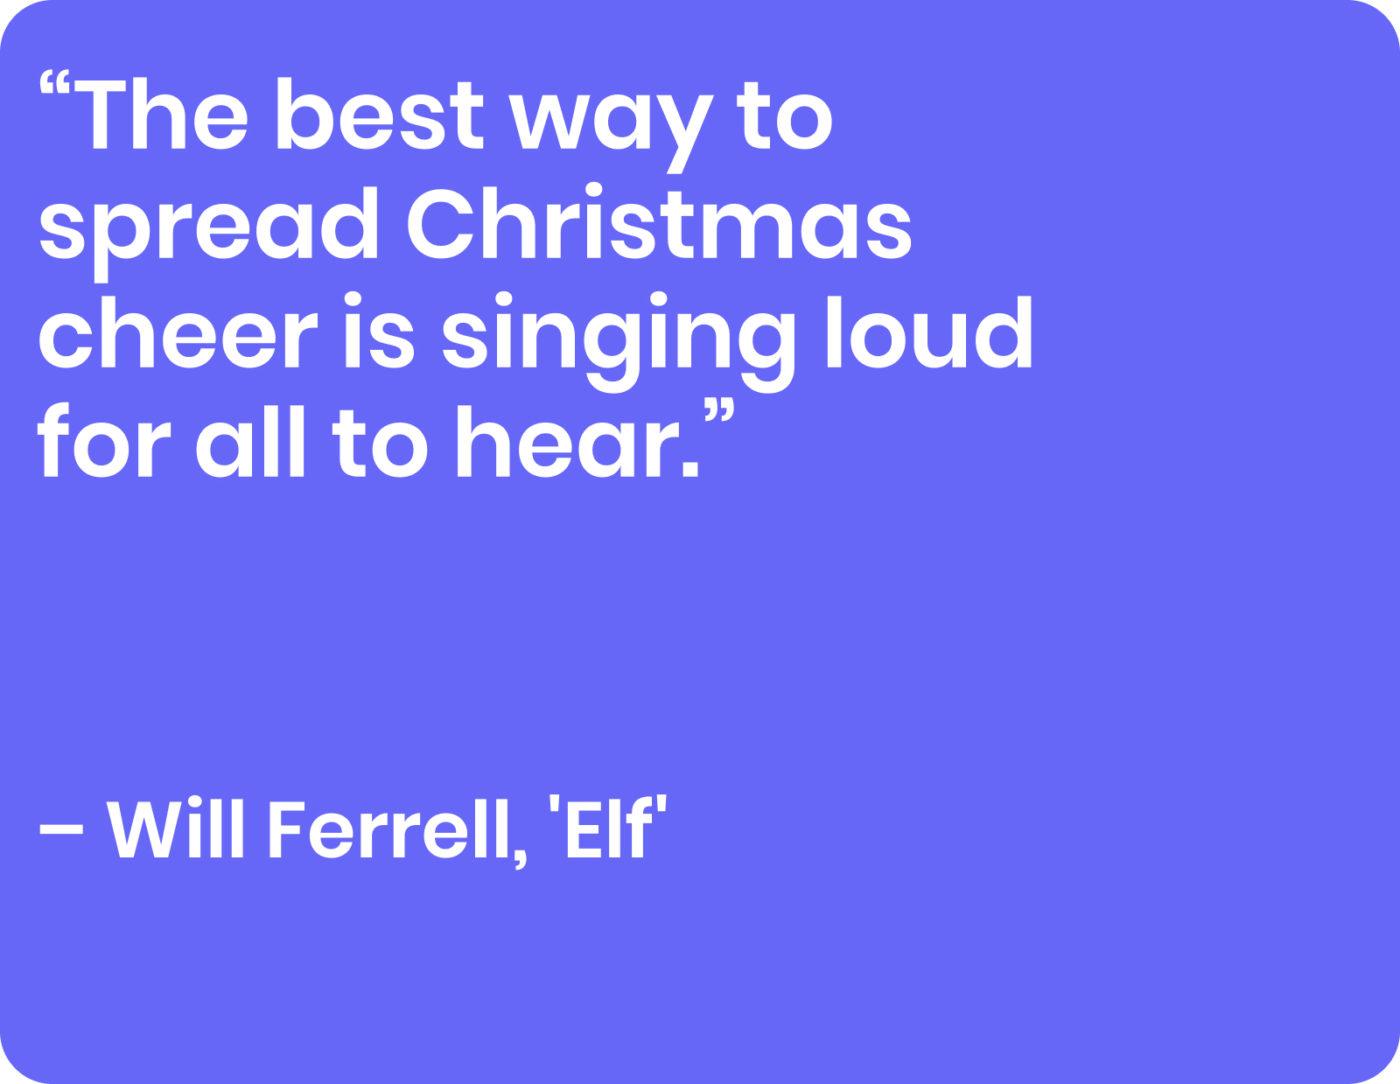 will ferrell, elf